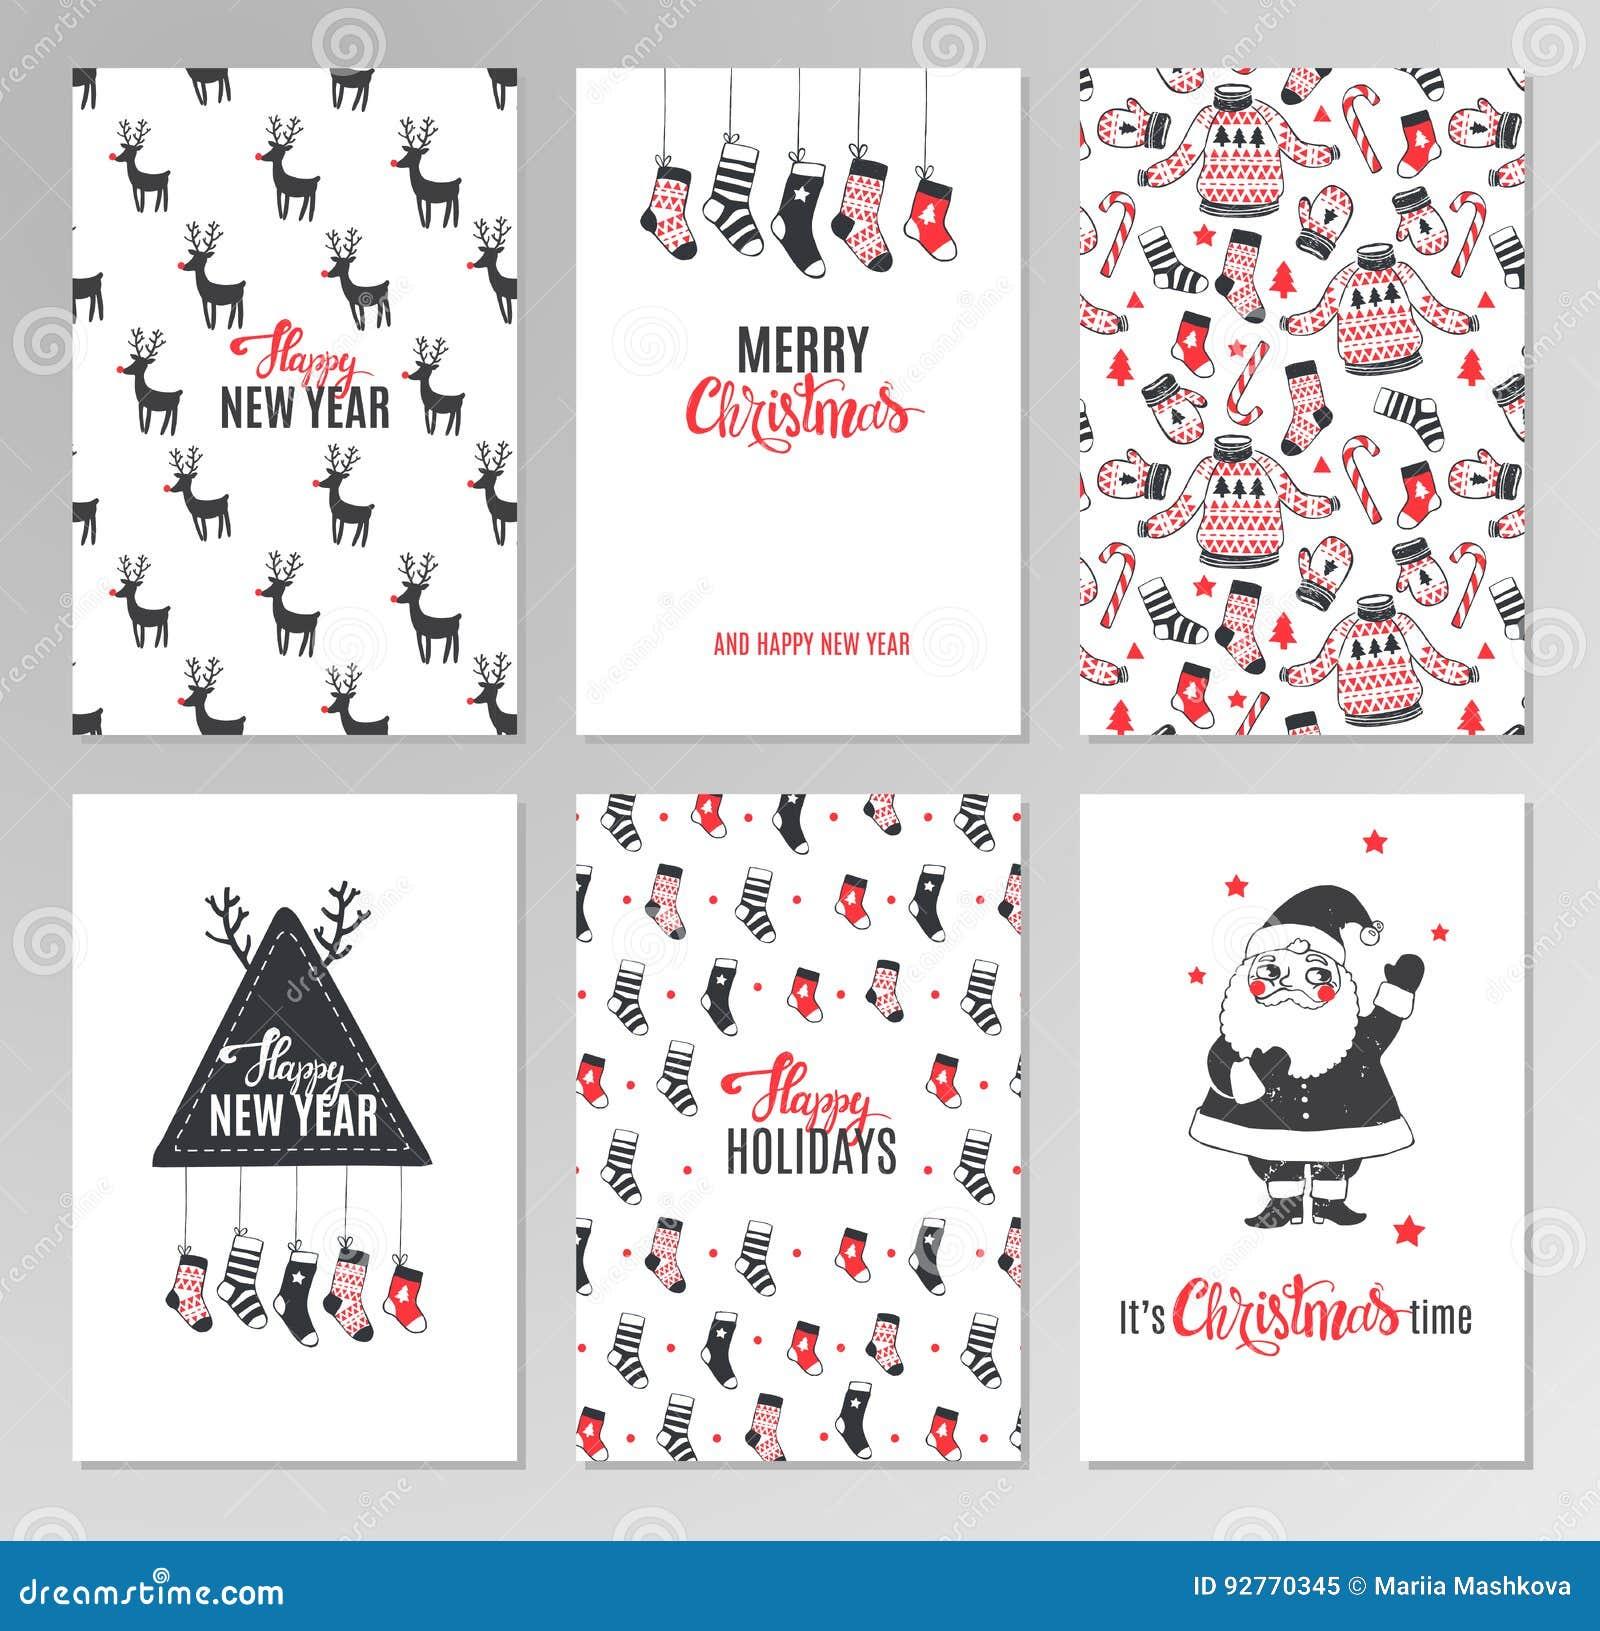 Christmas Hand Drawn Printable Cards. Stock Vector - Illustration of ...